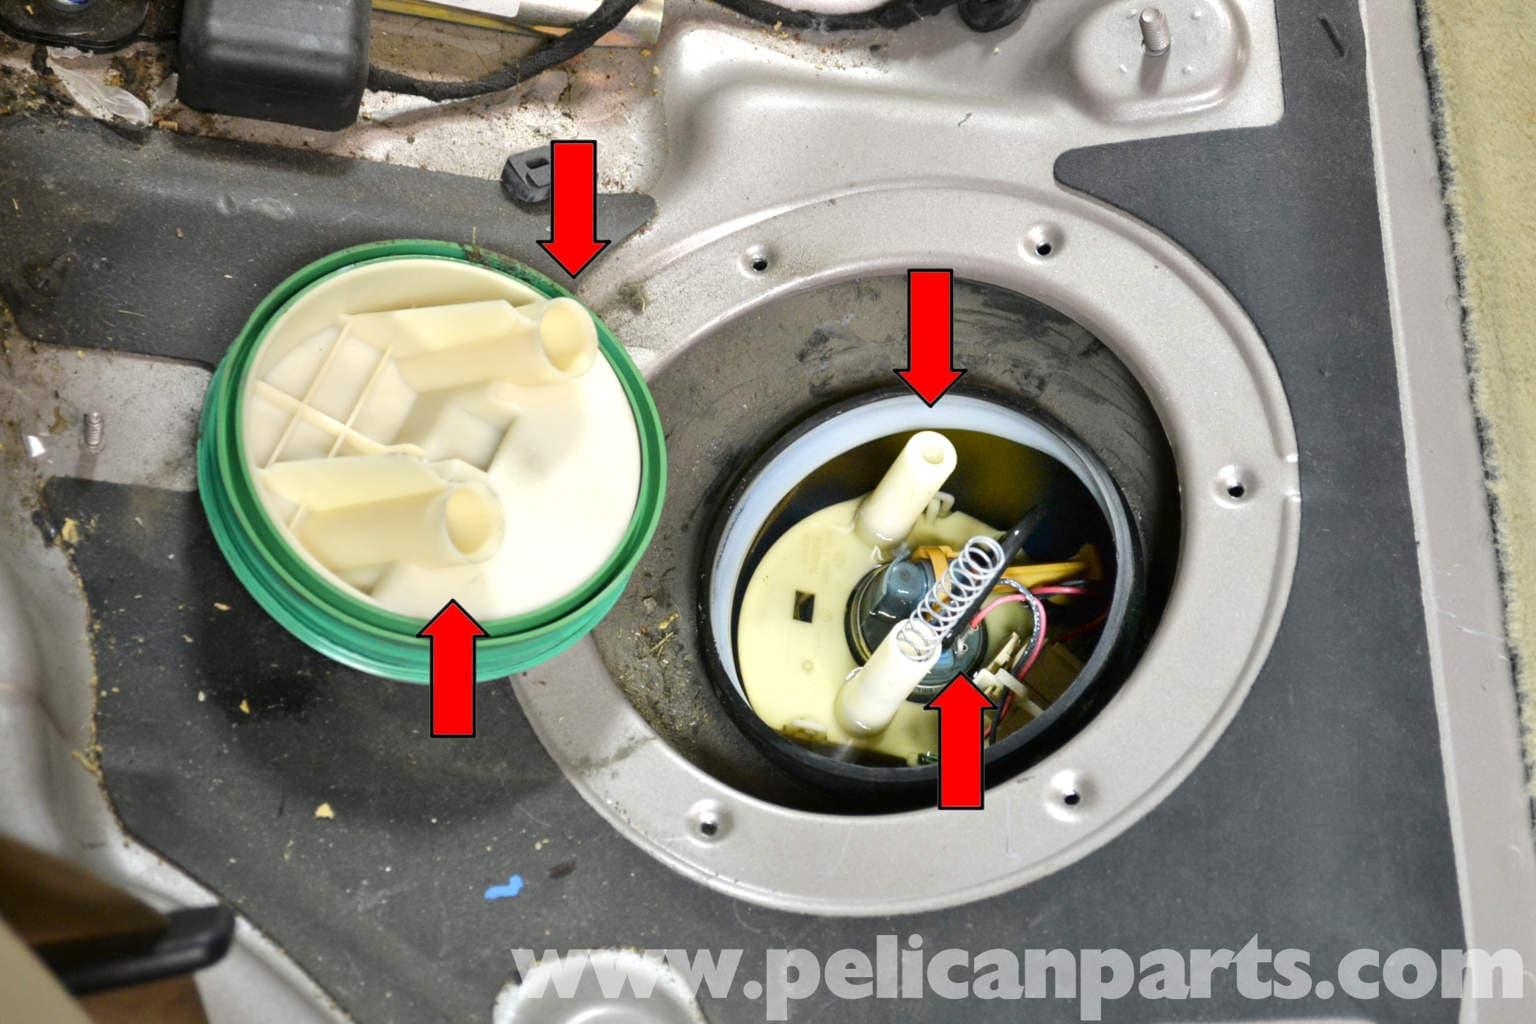 Mercedes Benz W203 Fuel Pump Replacement 2001 2007